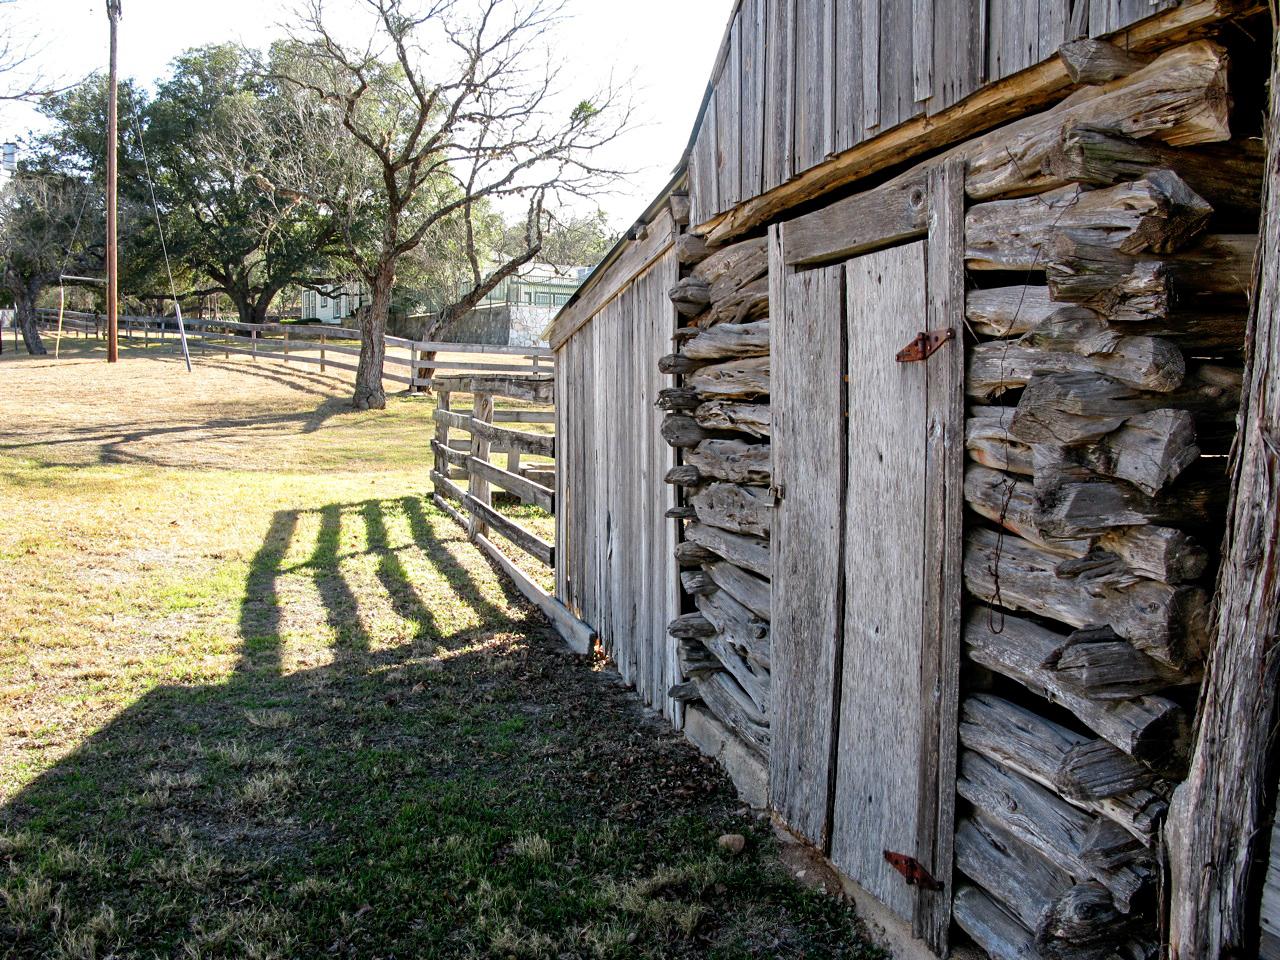 DGordin_090000_Texas_CFRanch_0004.jpg